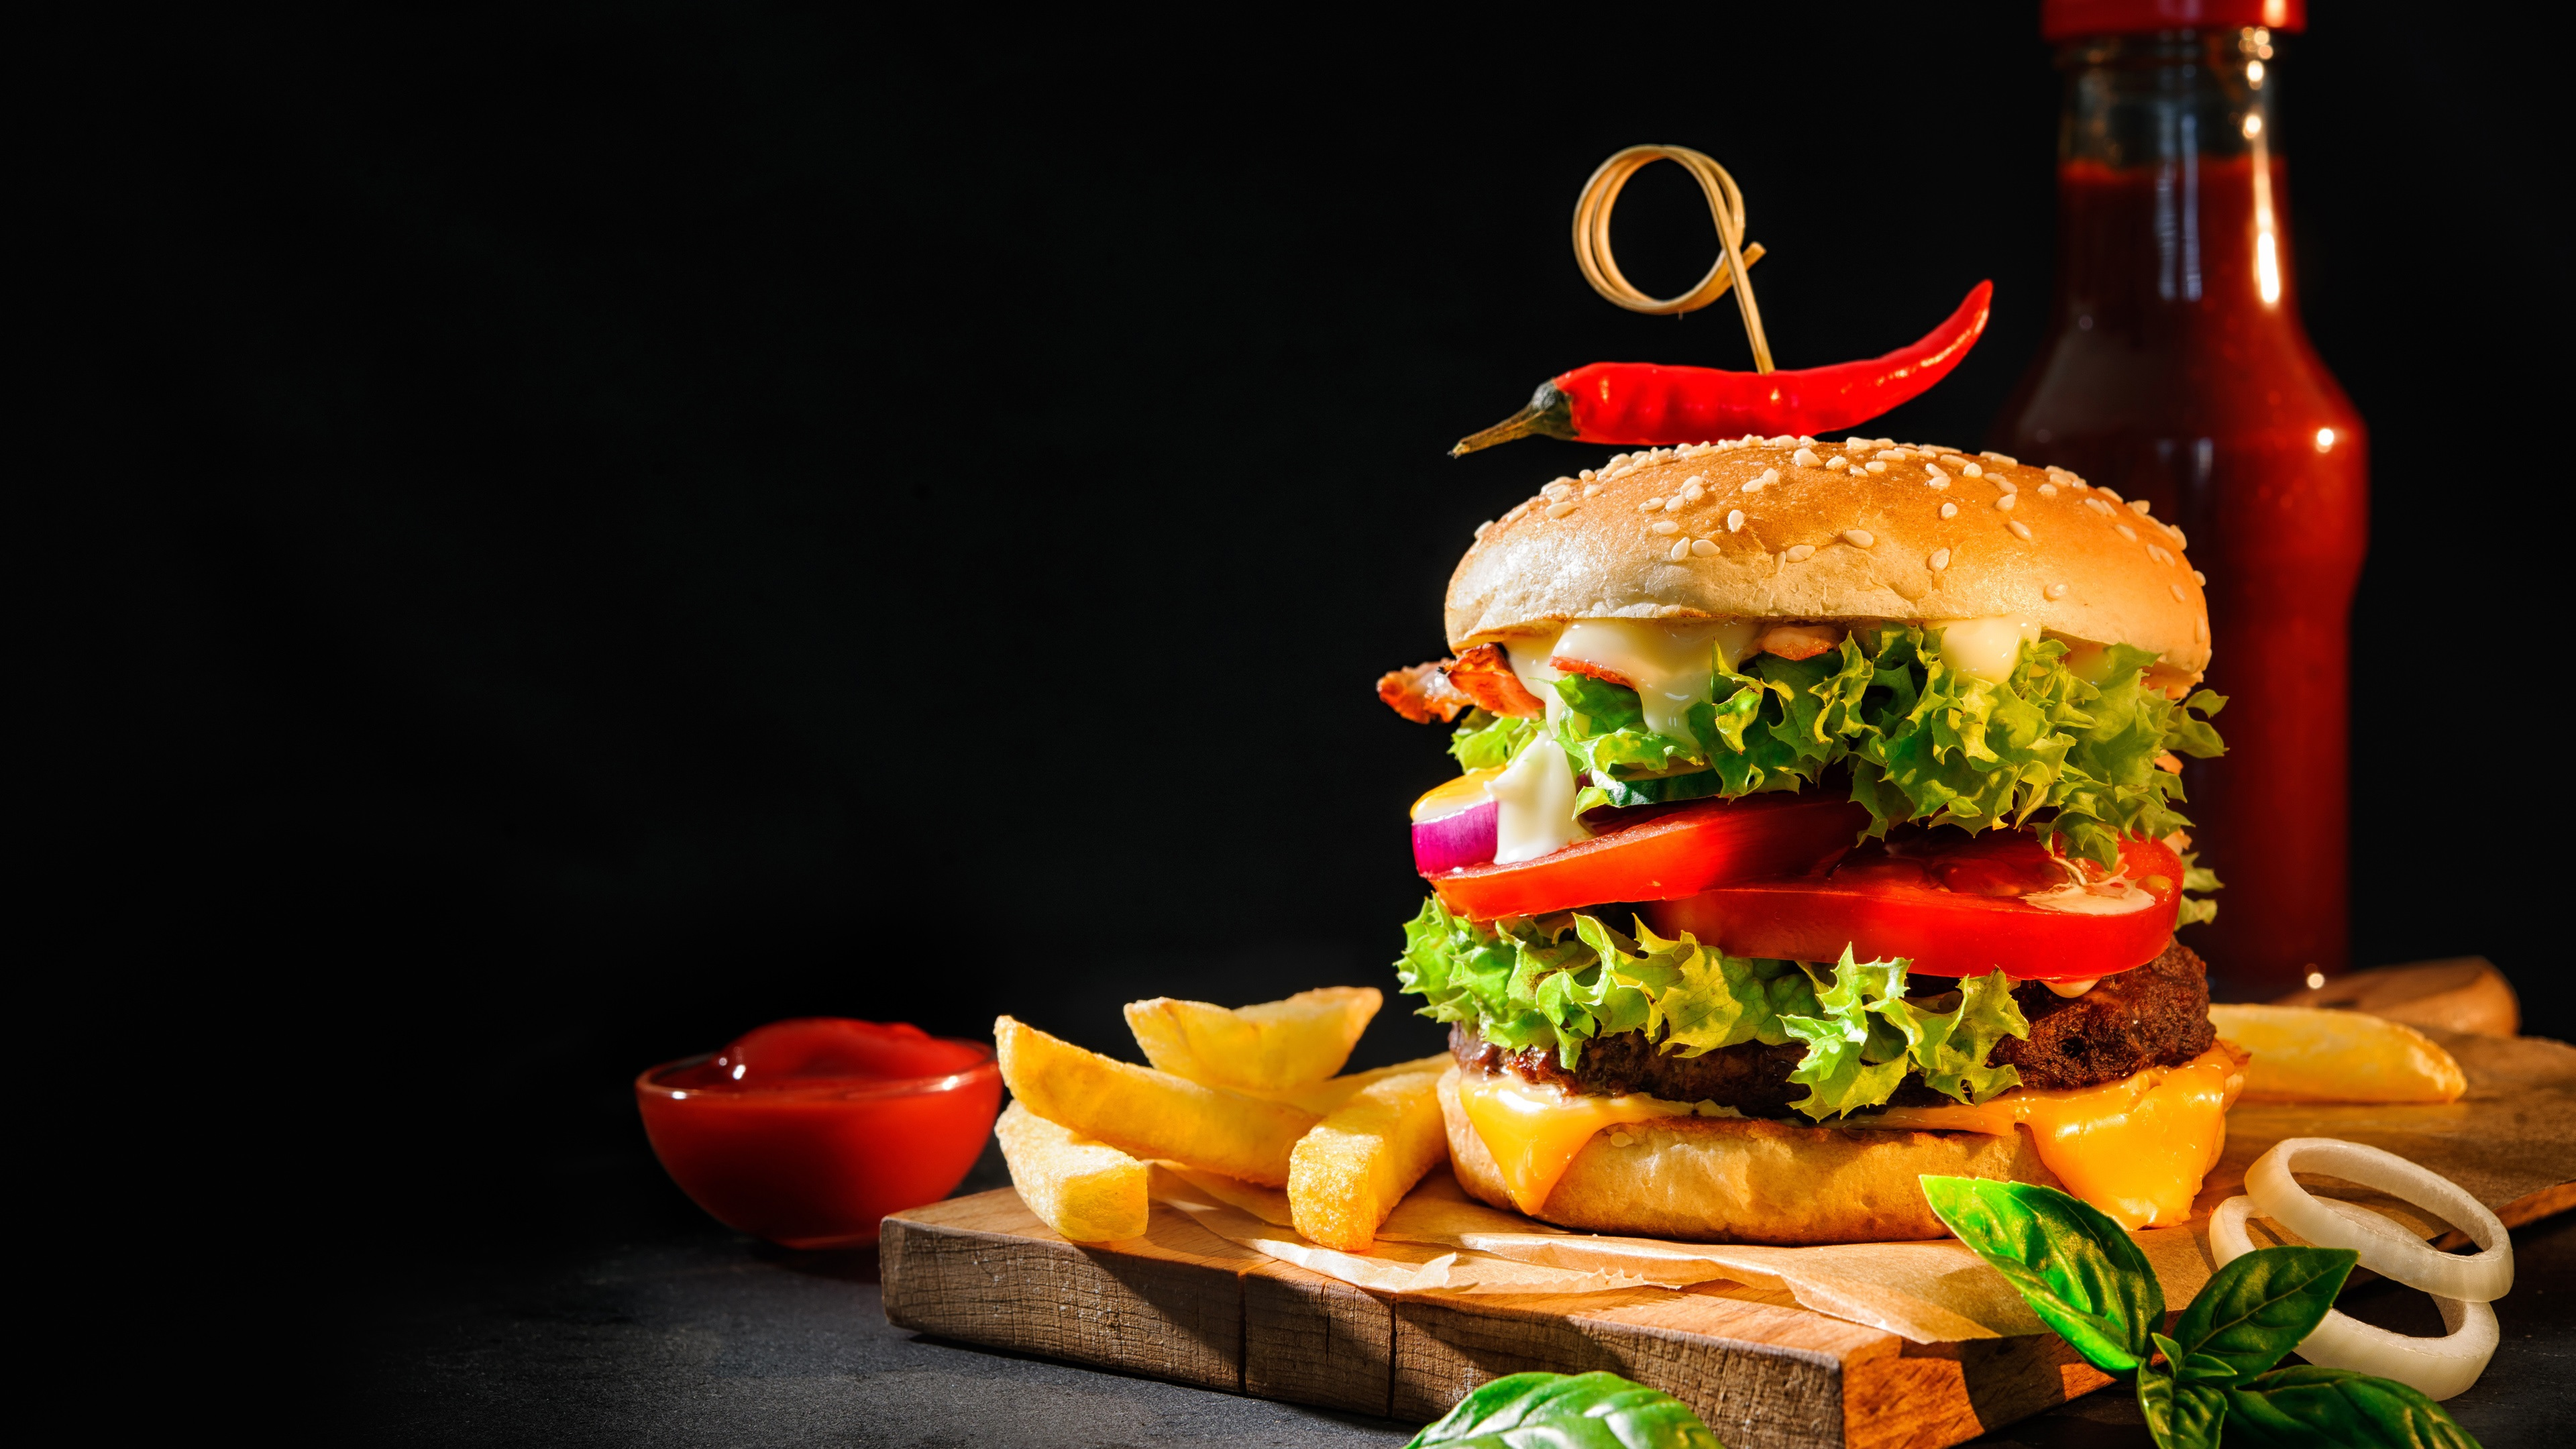 Fondos De Pantalla Hamburguesa, Ketchup, Papas Fritas